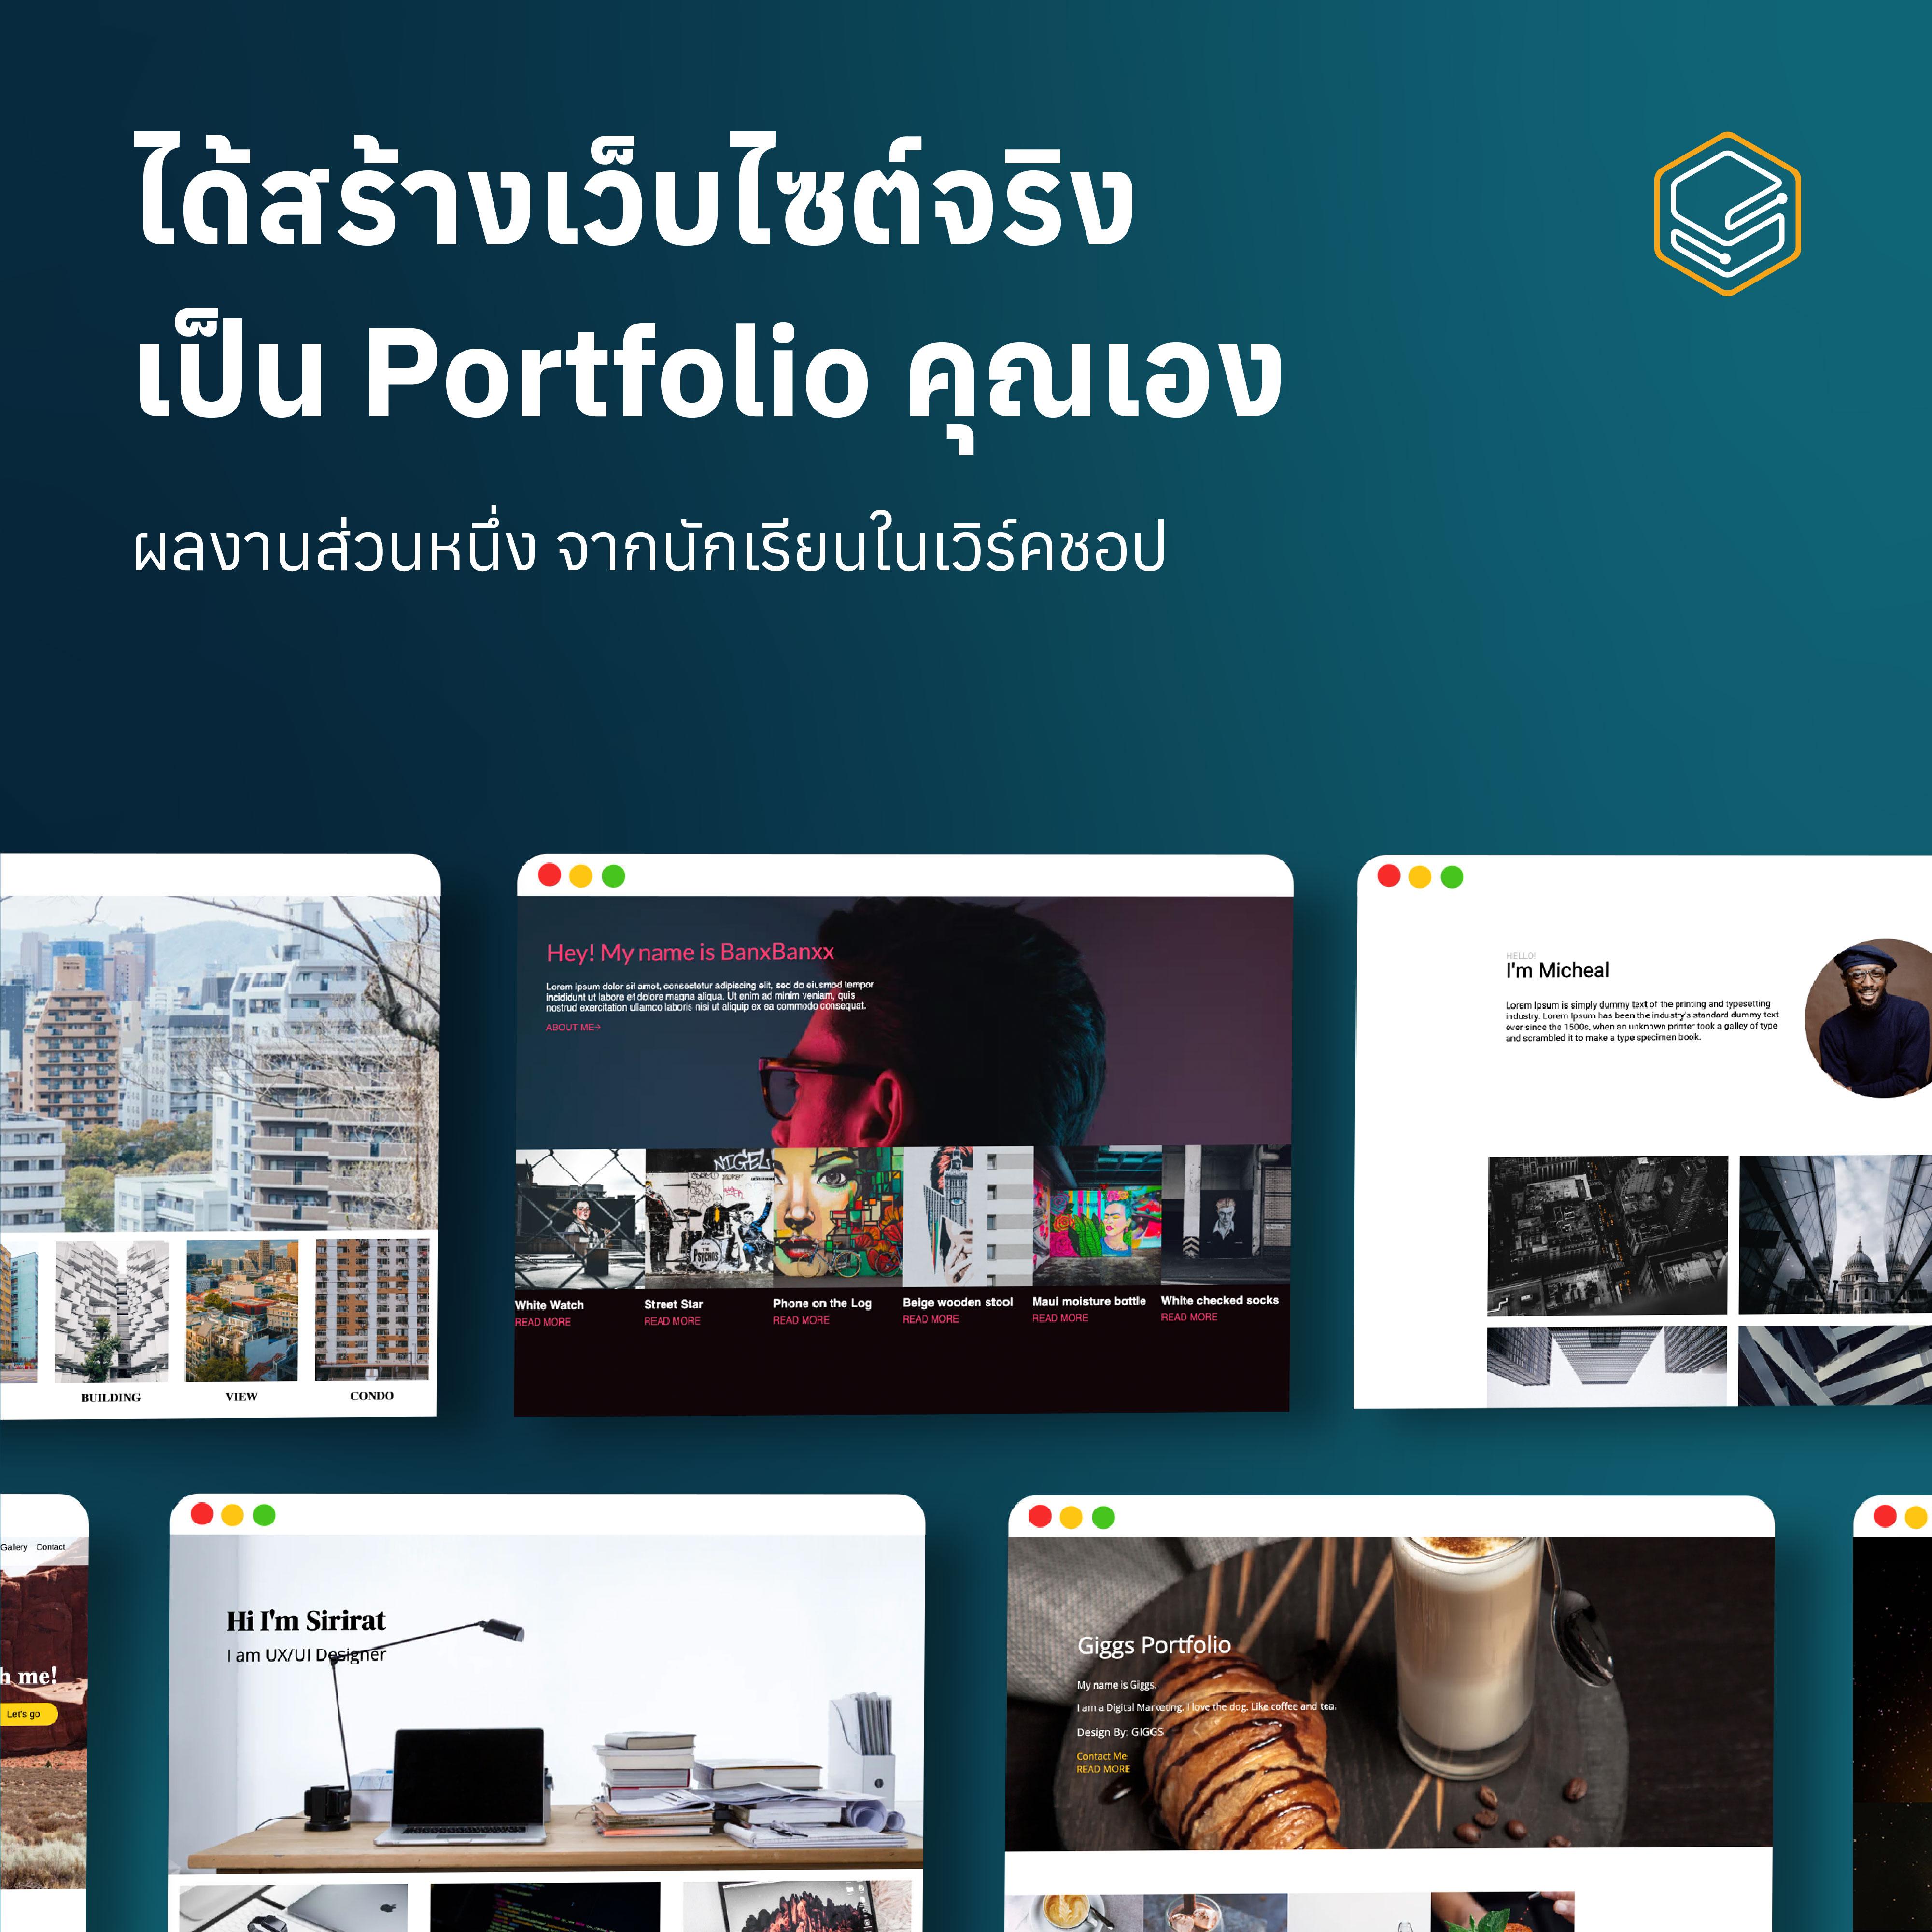 Skooldio Workshop: CSS for Designers